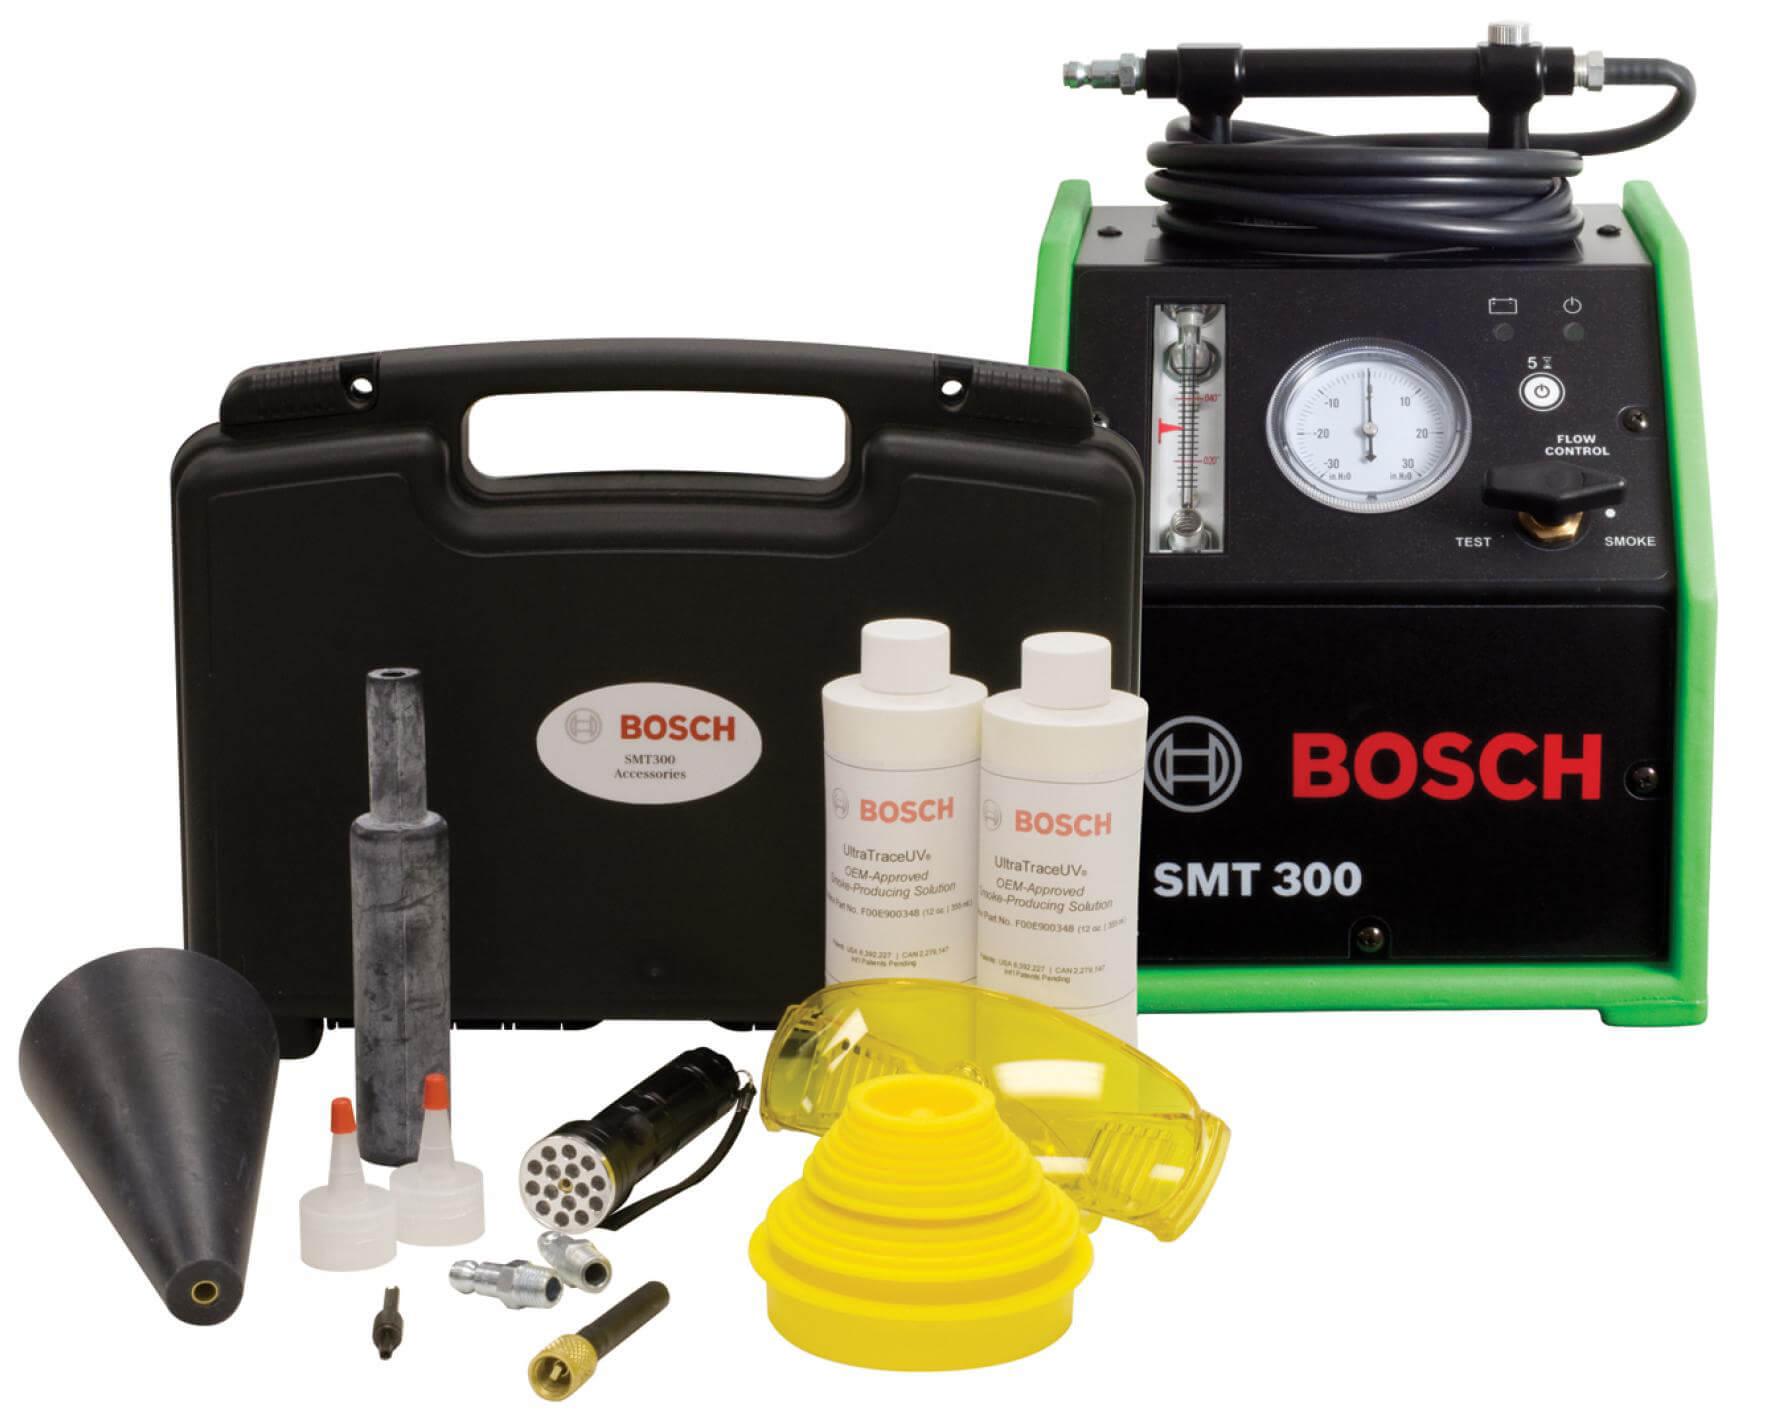 bosch-smt-300